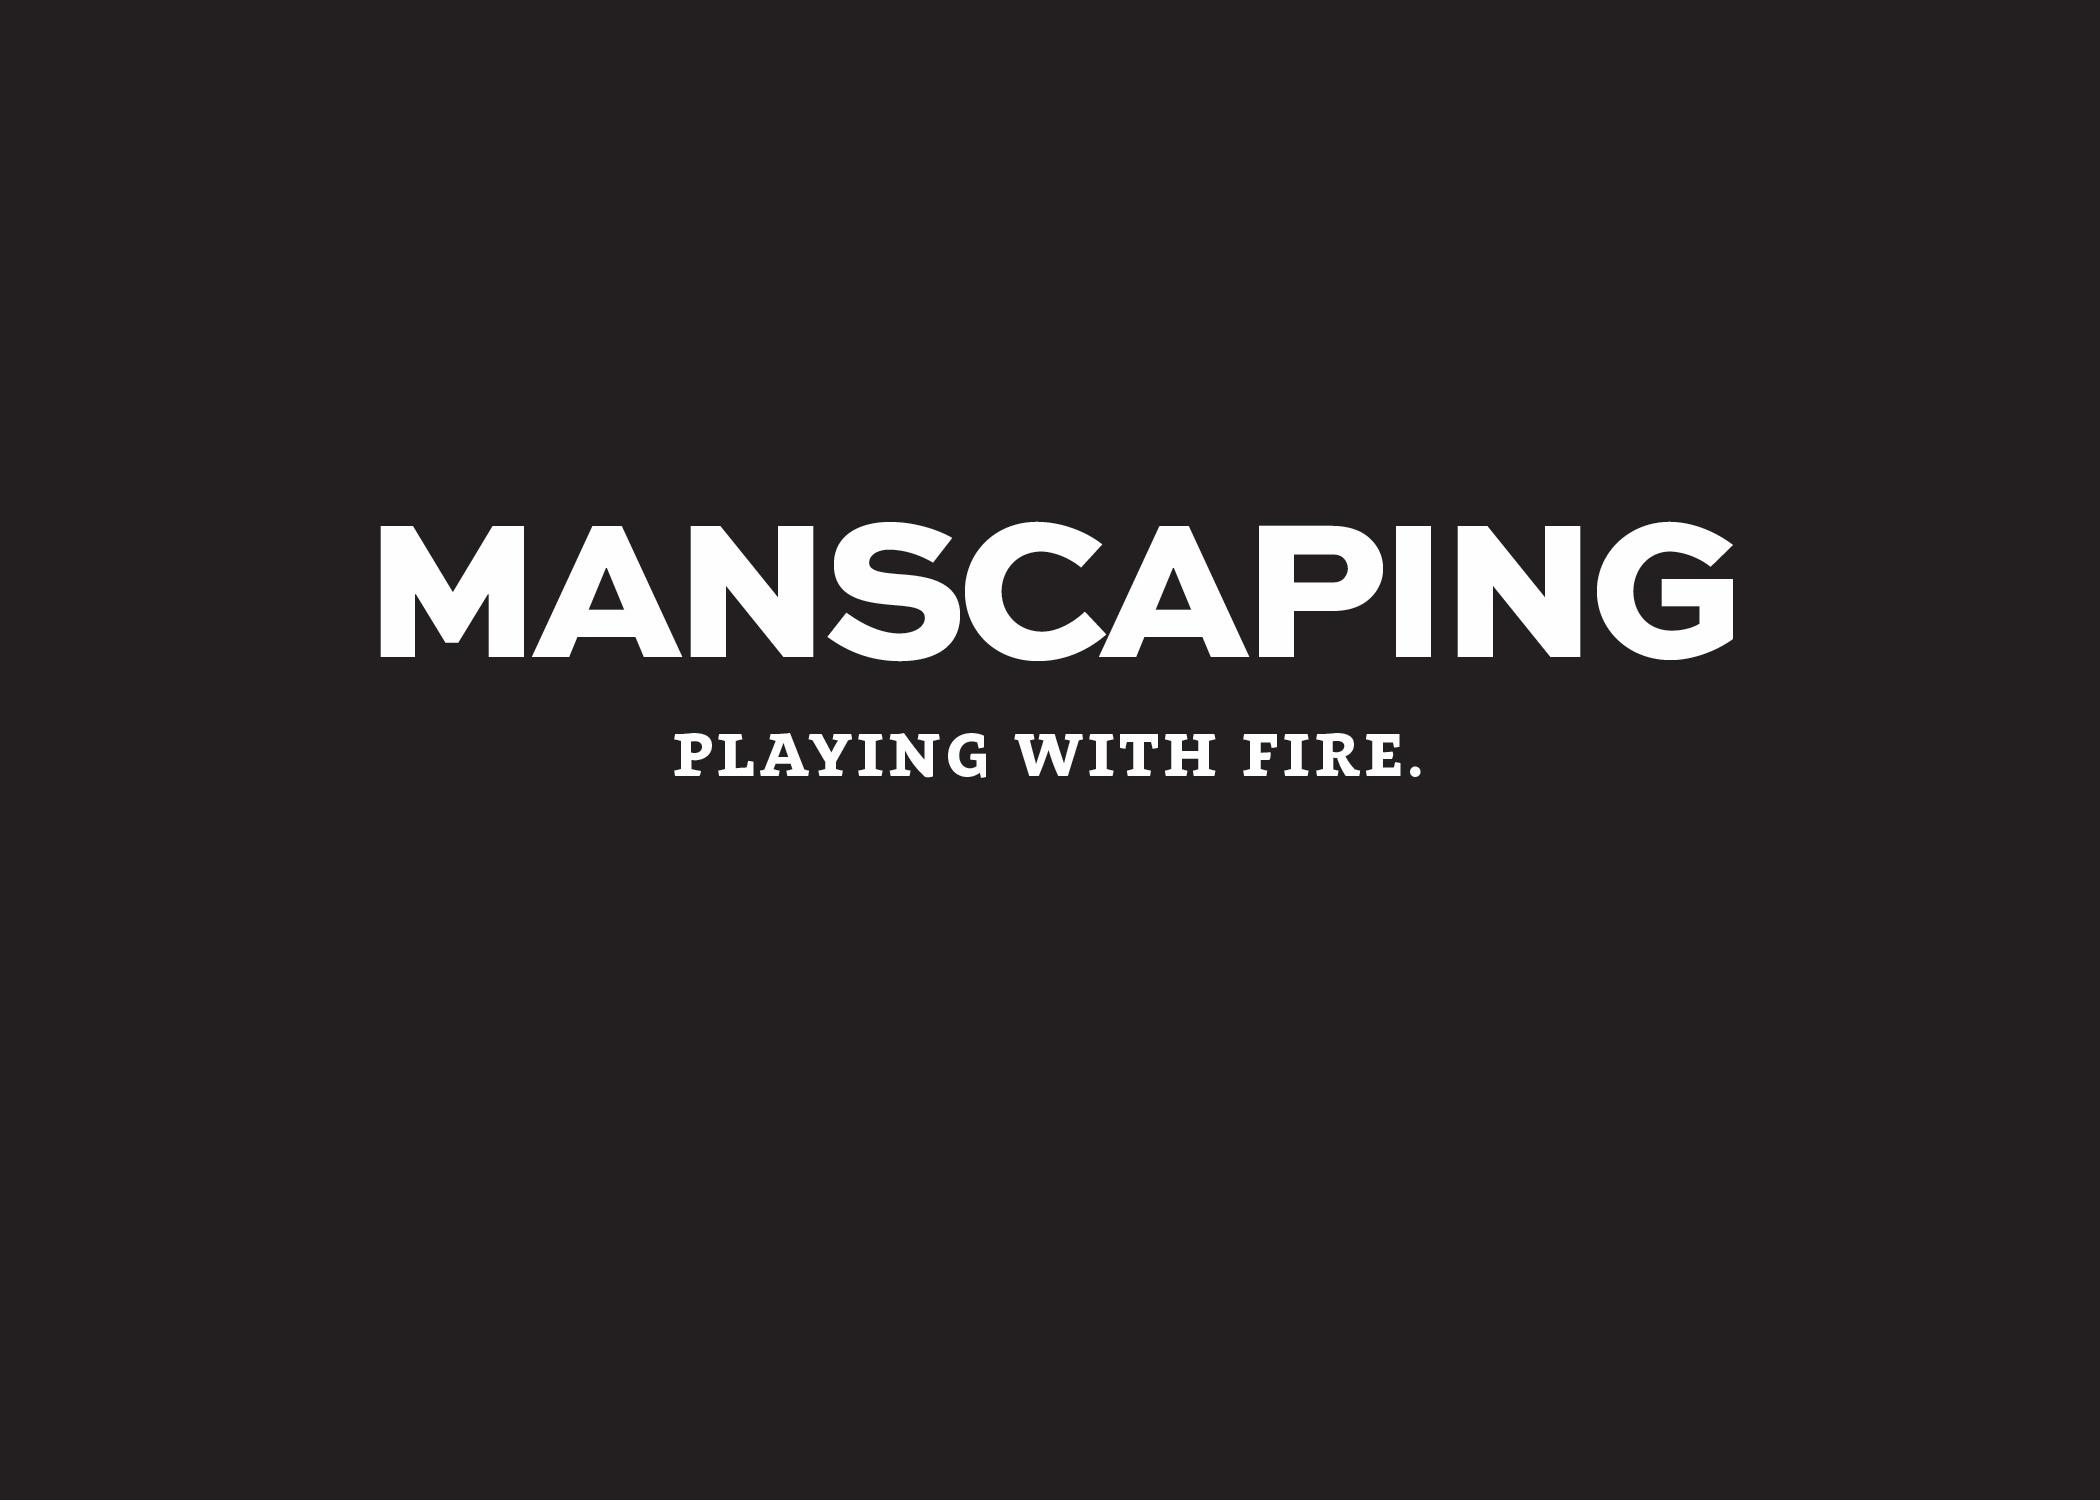 Manscaping Zine